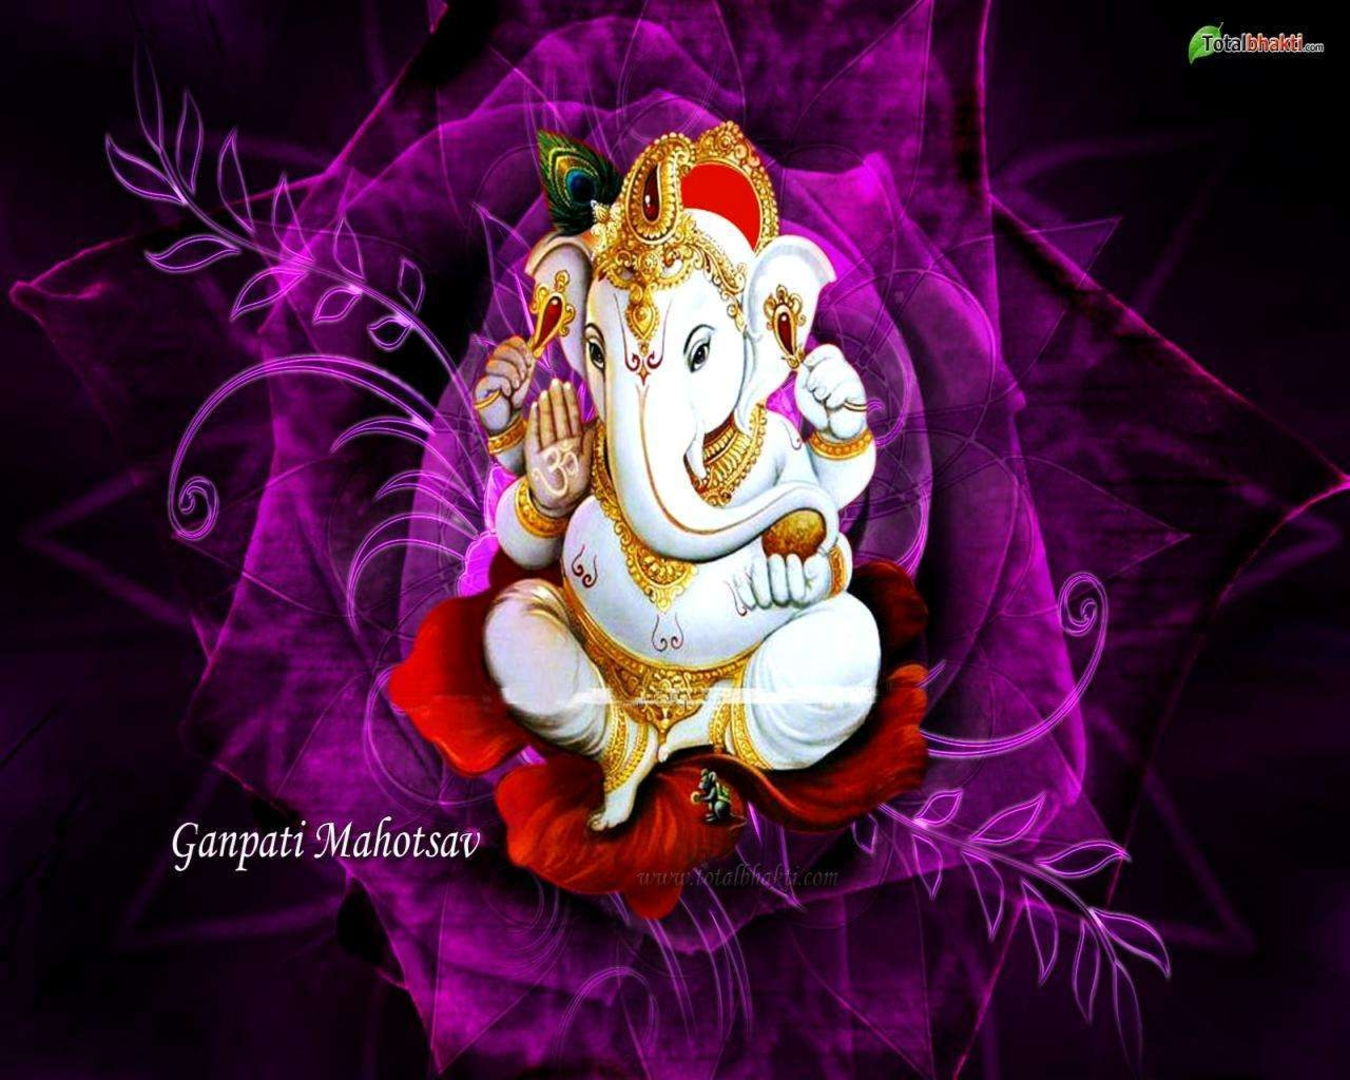 Hindu Gods Wallpaper For Desktop: Hindu Gods Wallpaper For Desktop